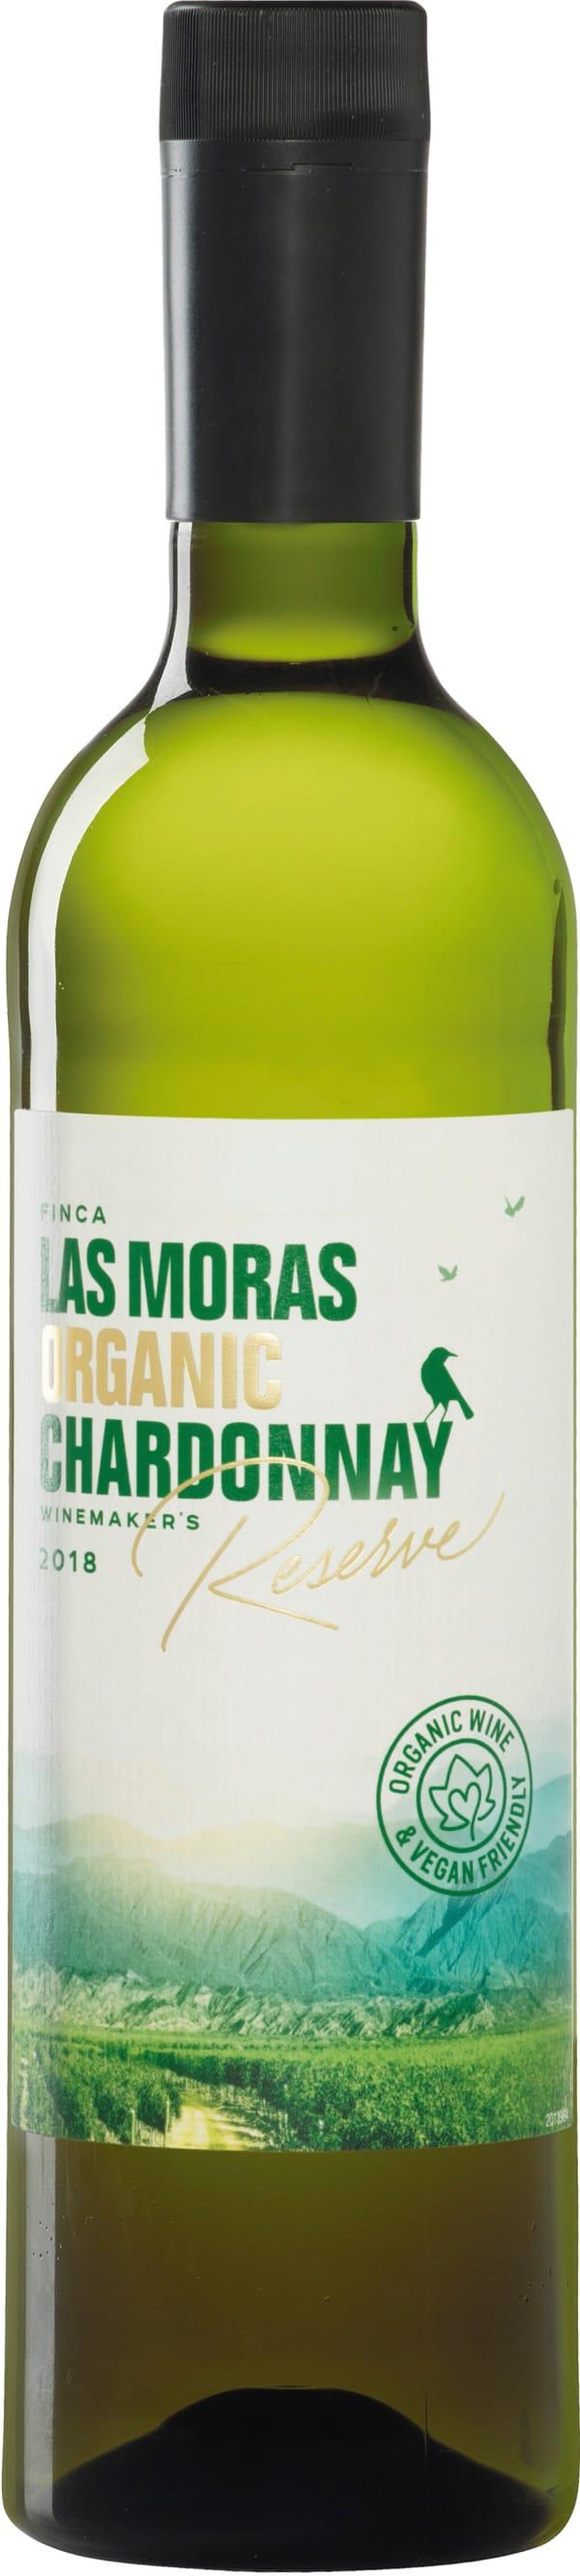 Finca Las Moras Organico Reserve Chardonnay 2018 plastic bottle